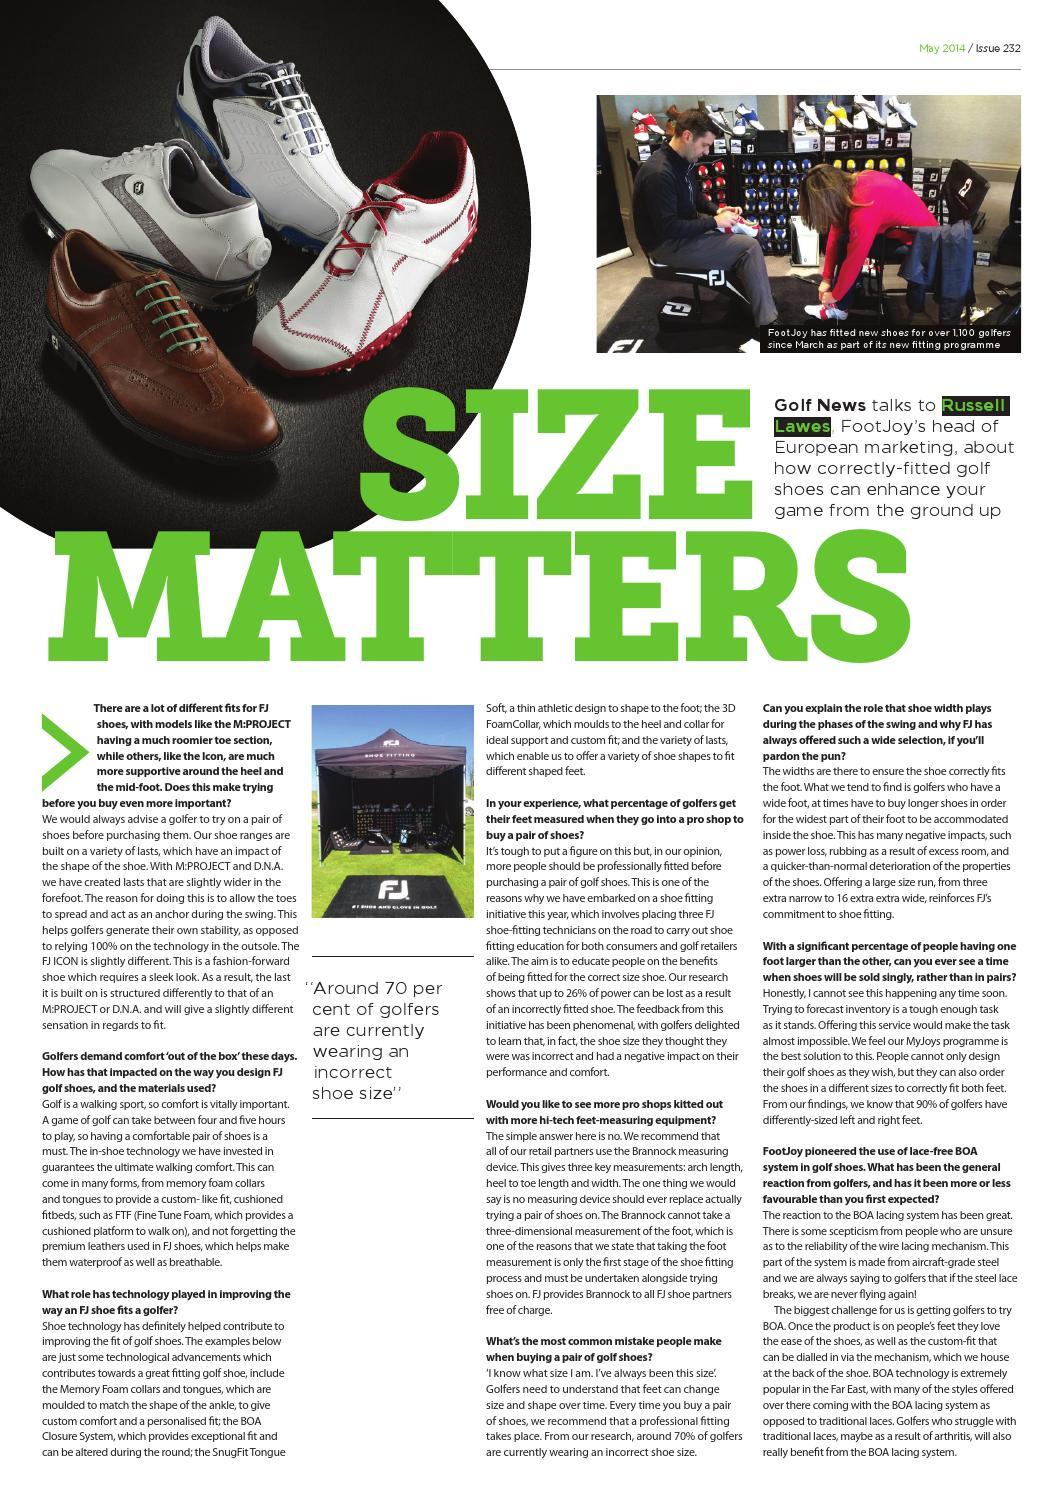 Golf News May 2014 by Golf News - issuu